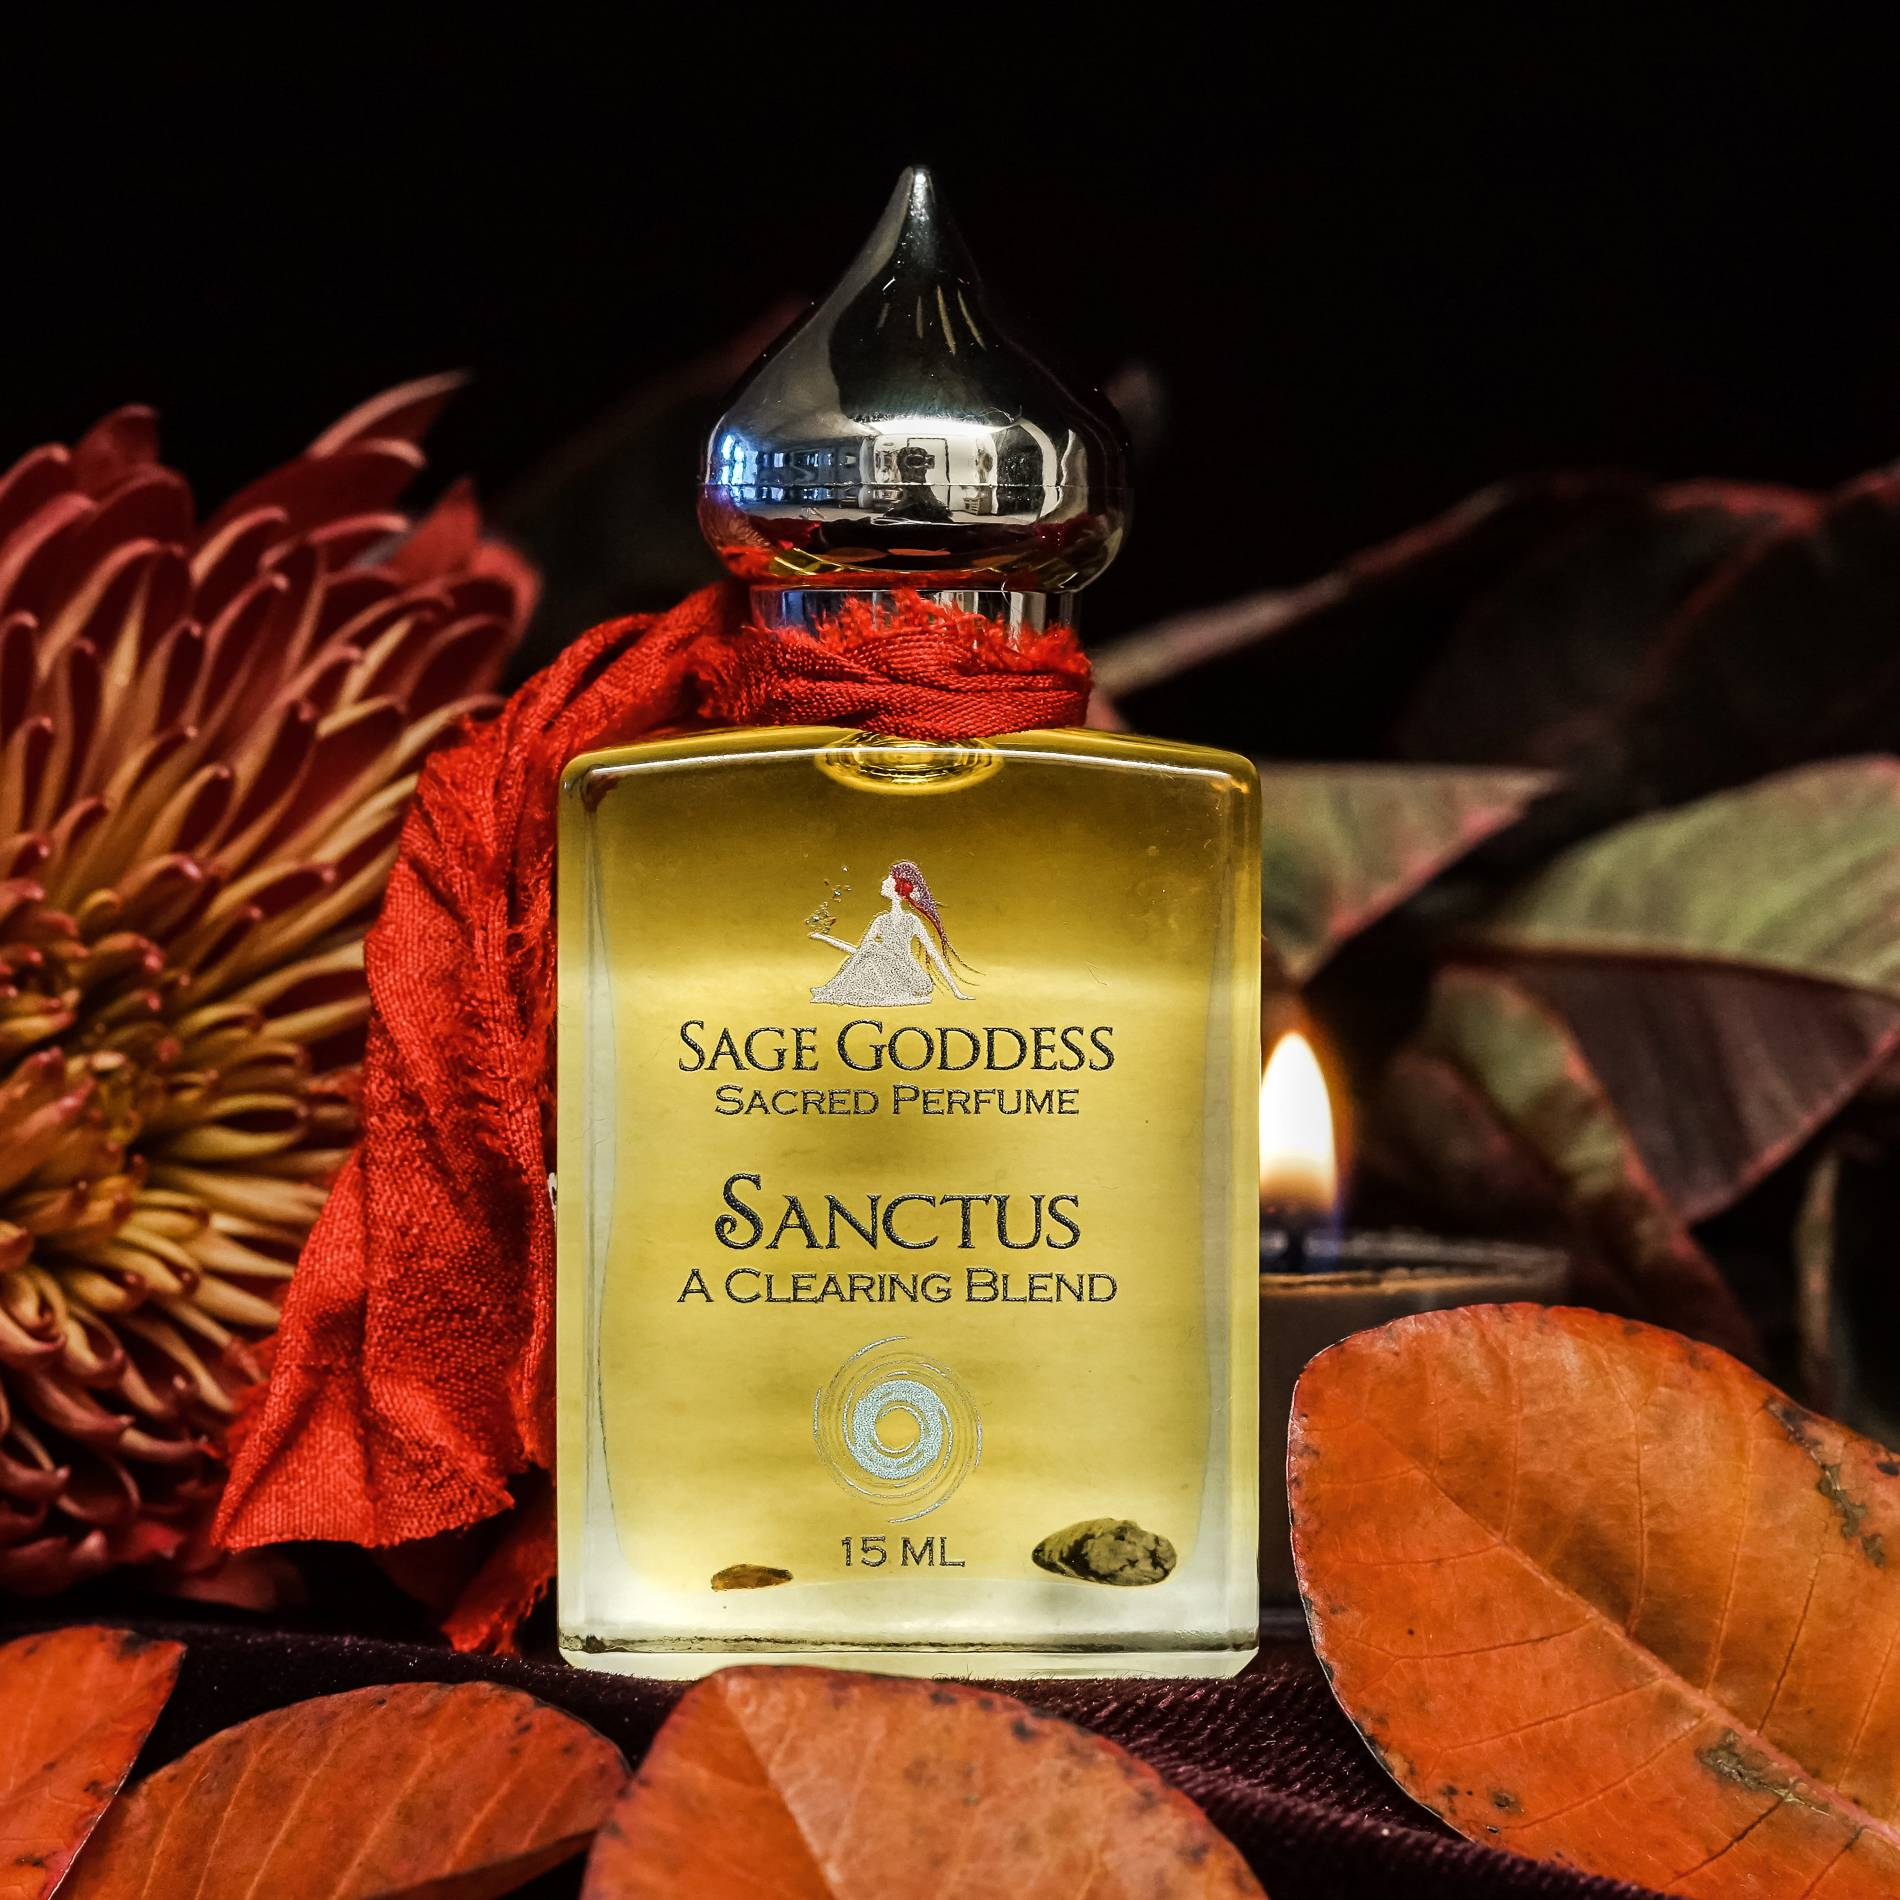 Sanctus perfume